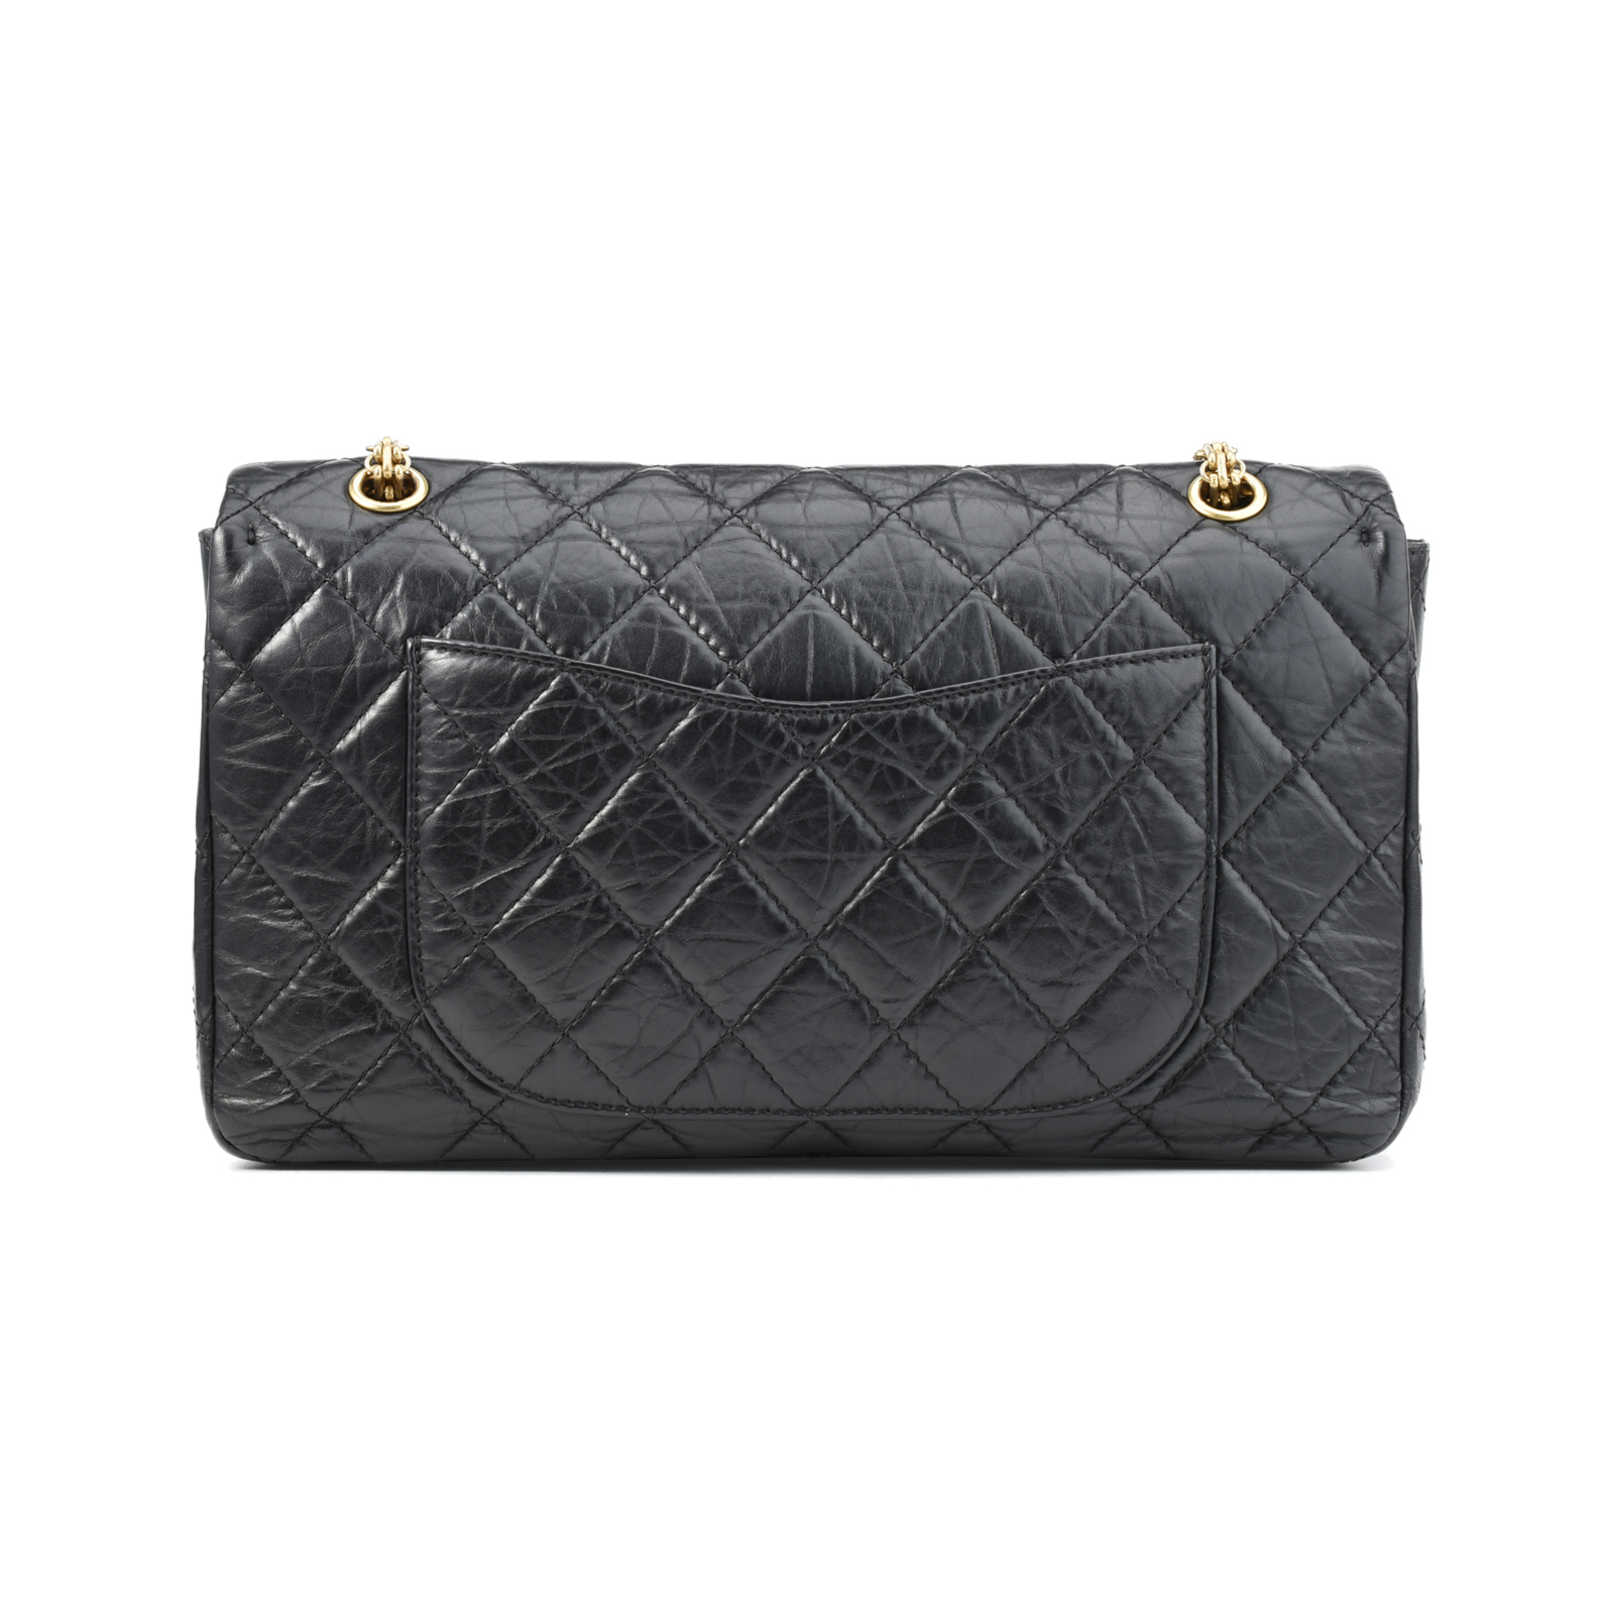 da63841d25c275 ... Authentic Second Hand Chanel Reissue 2.55 (PSS-001-00032) - Thumbnail 1  ...